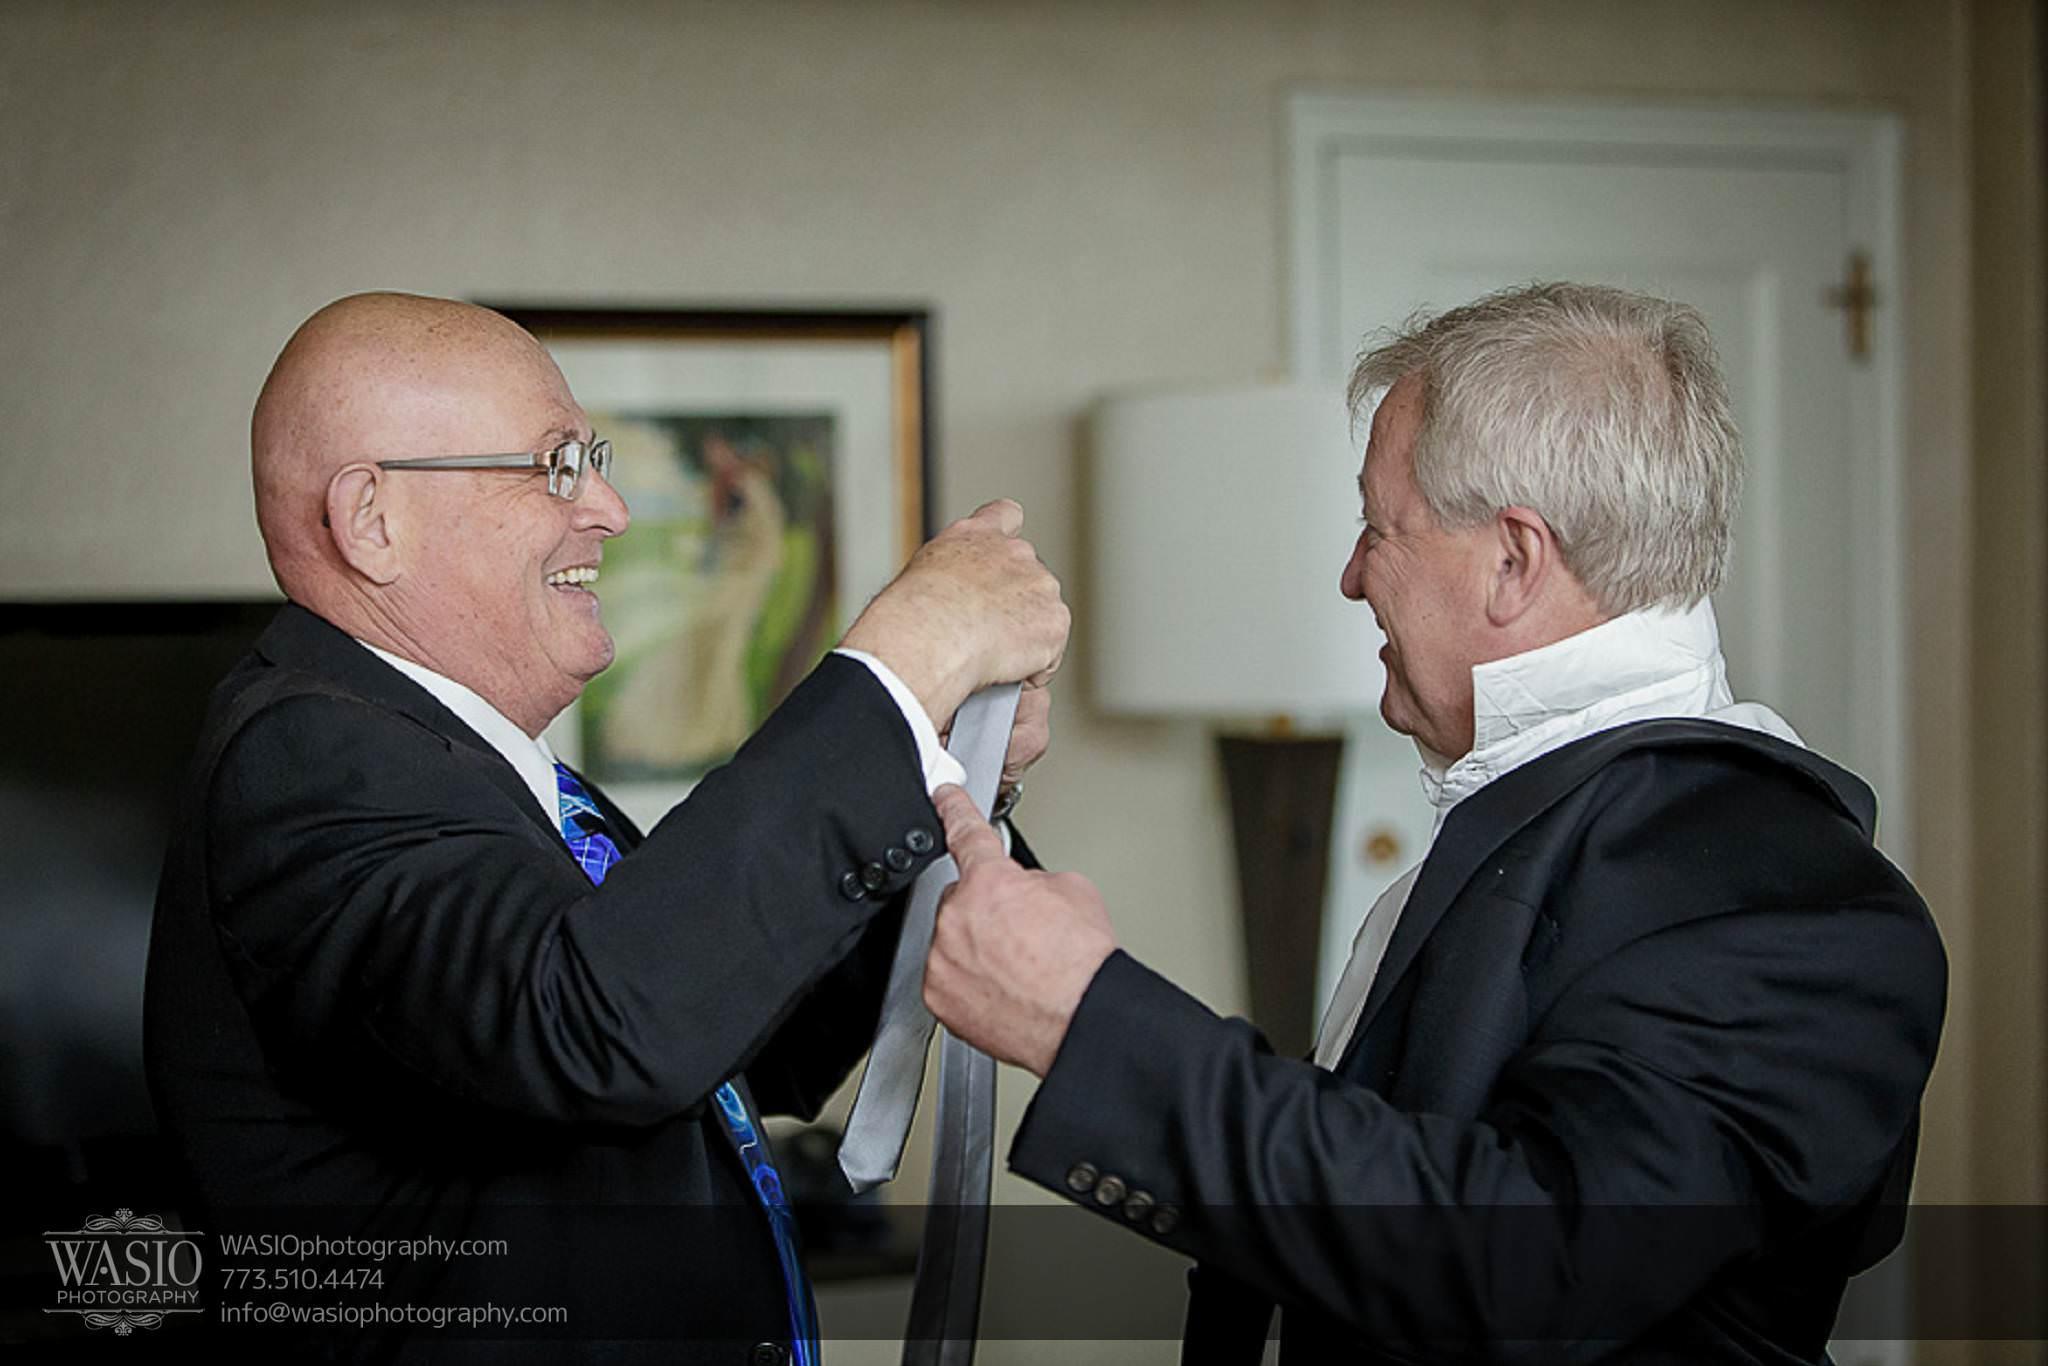 Chicago-wedding-photos-fathers-preparation-ties-laughing-fun-memory-037 Chicago Wedding Photos - Svetlana + Yuriy